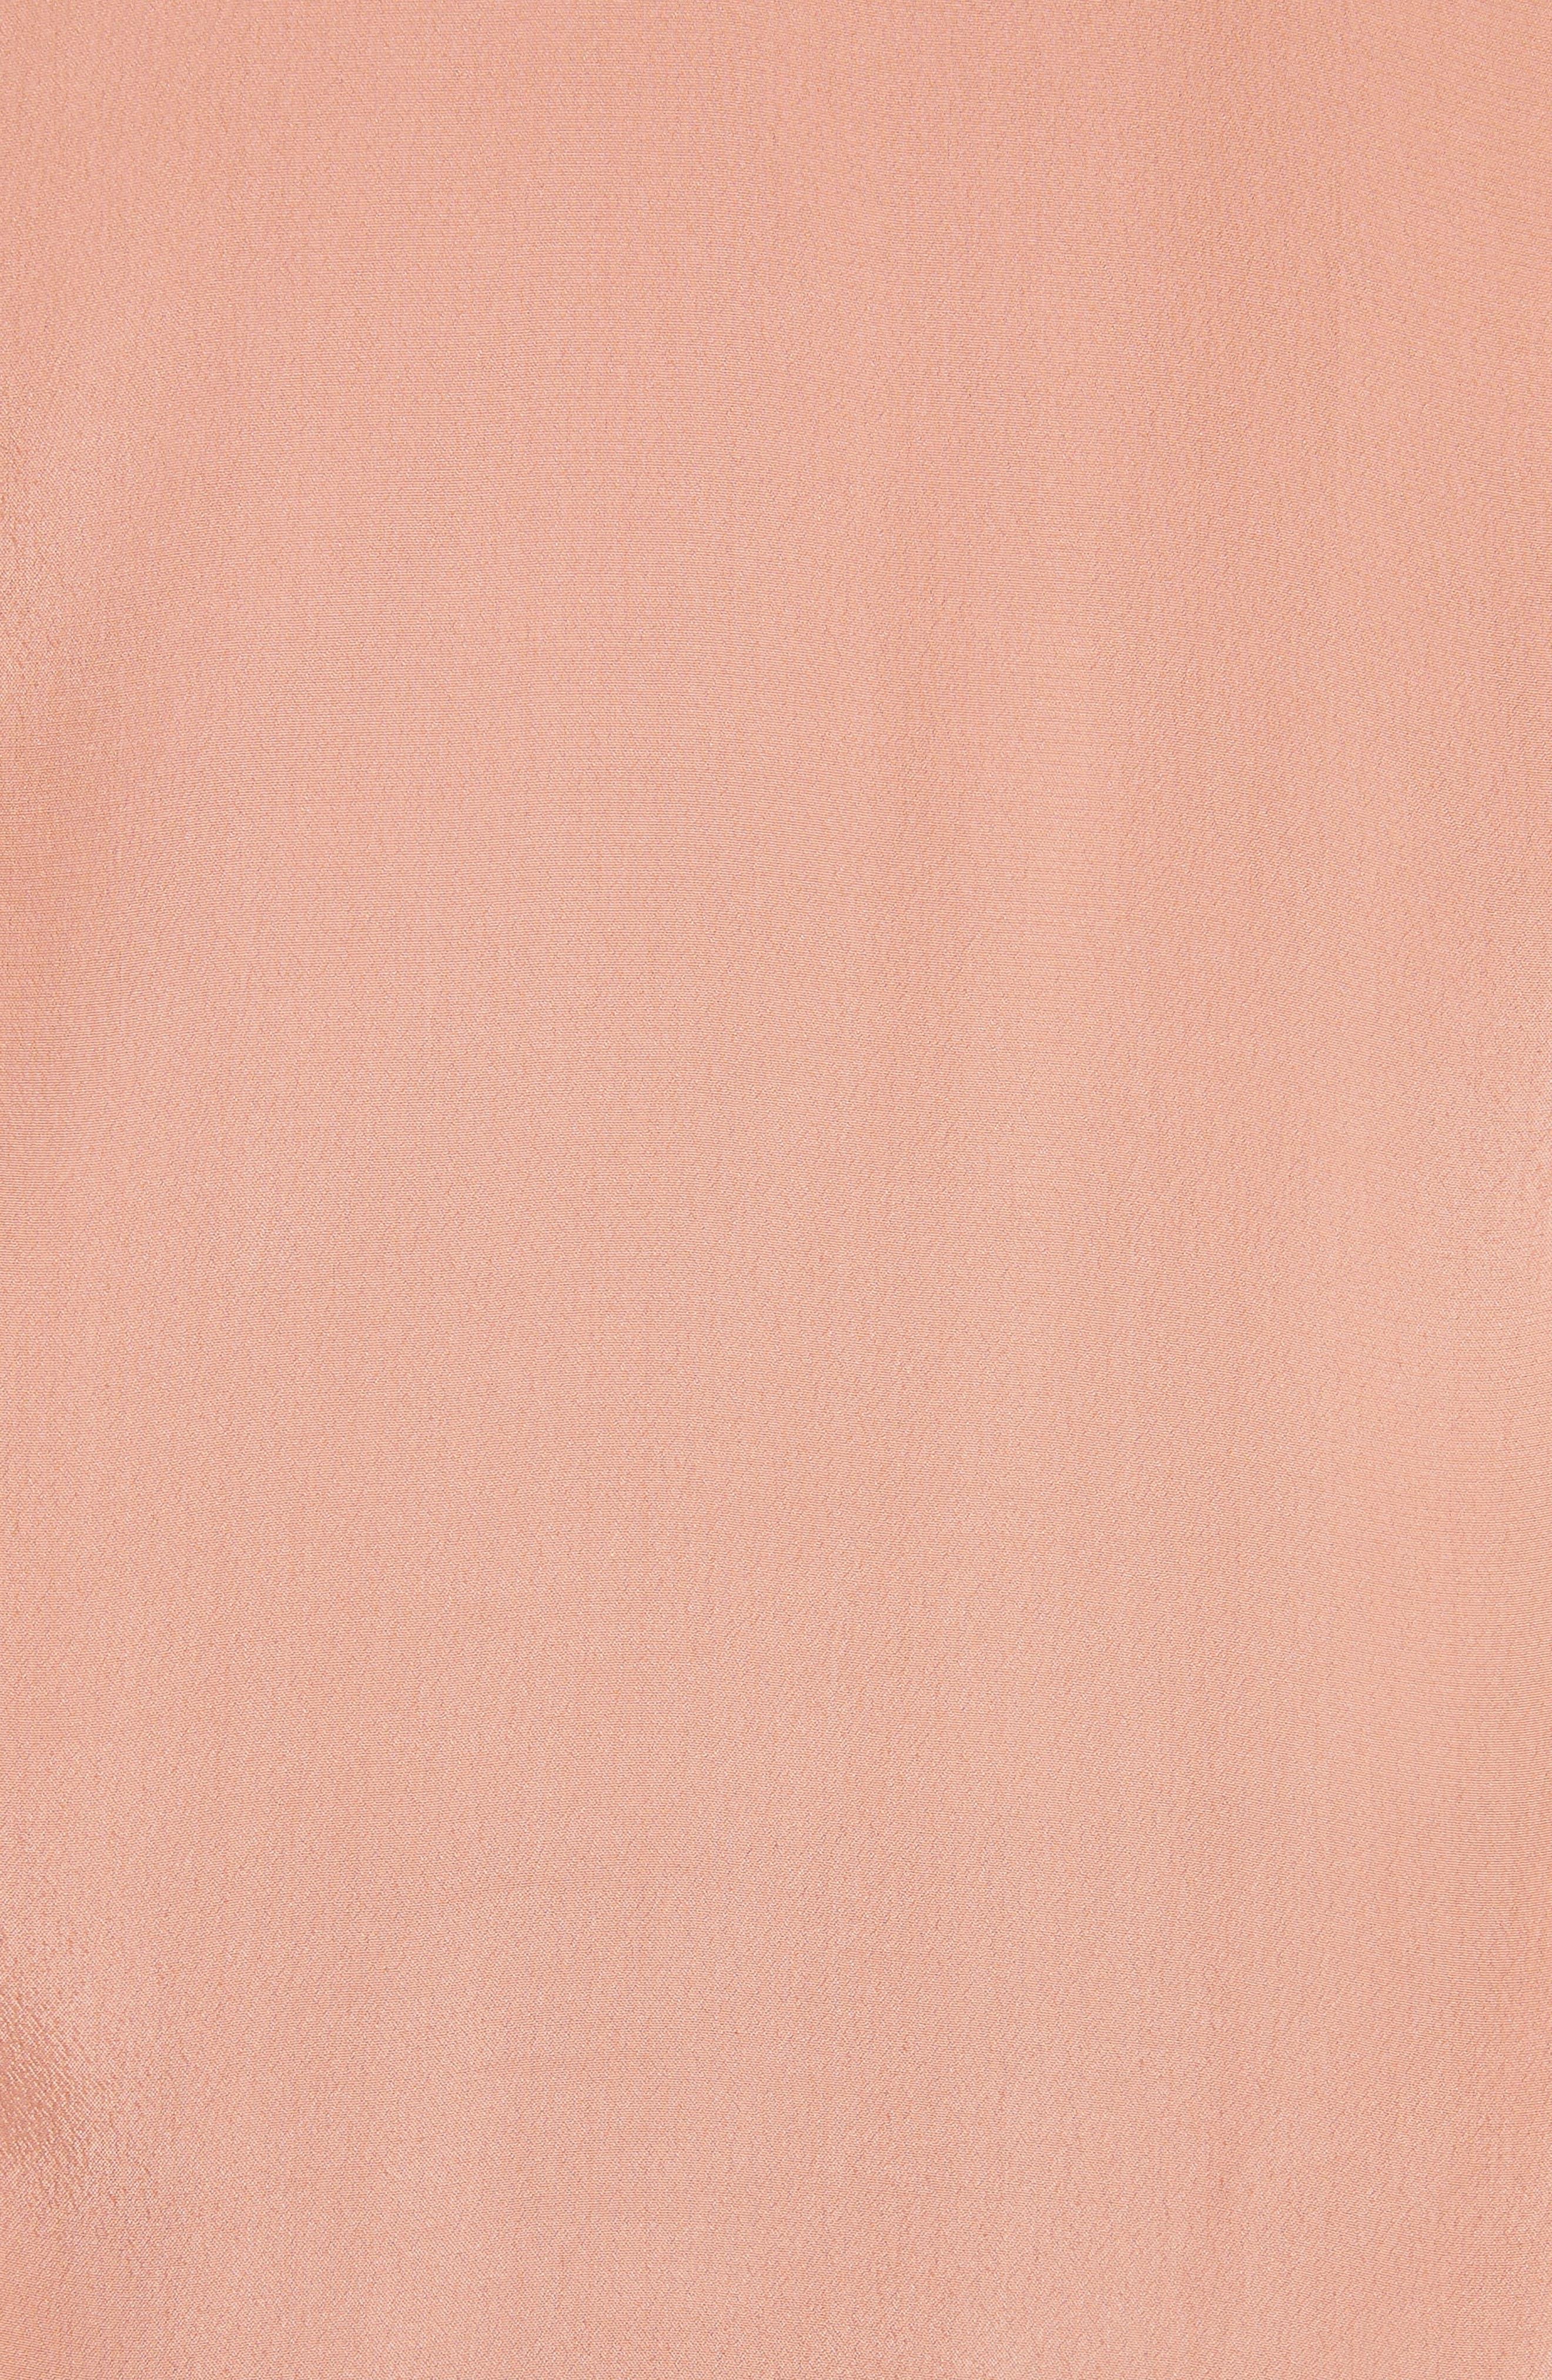 Ruffle Balloon Sleeve Top,                             Alternate thumbnail 5, color,                             Past Rose